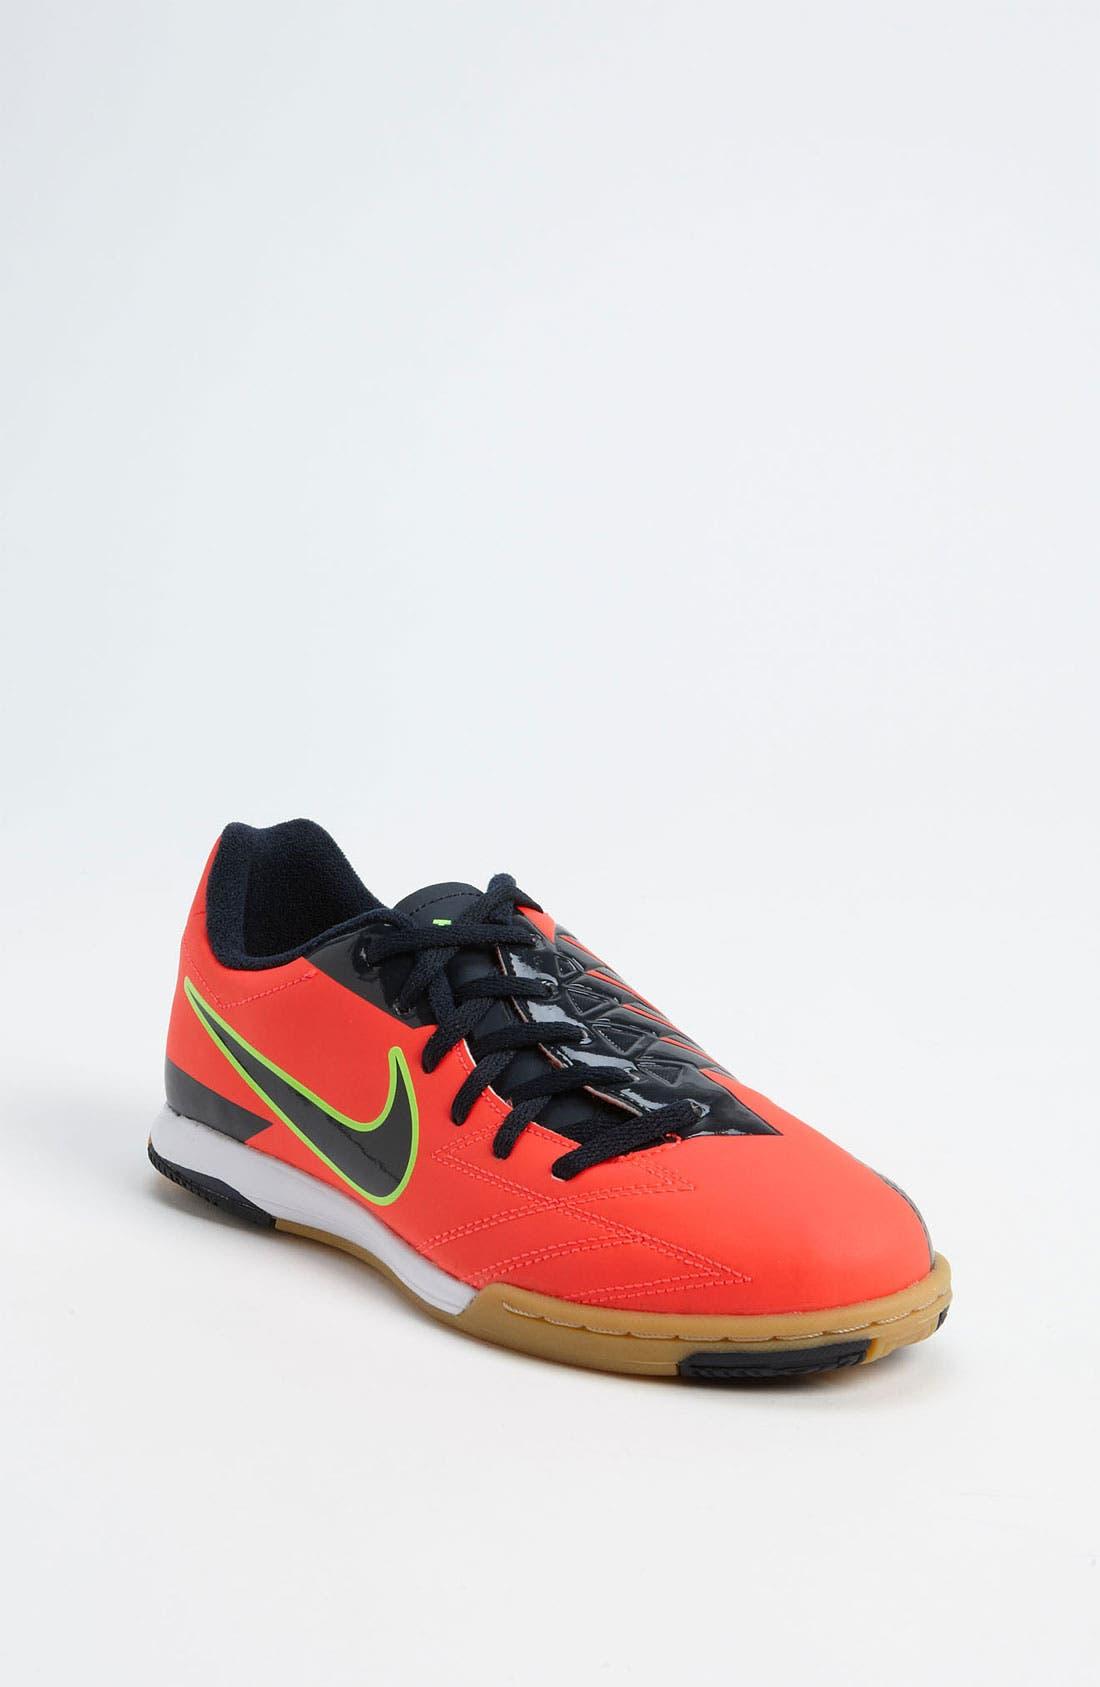 Main Image - Nike 'T90 Shoot IV' Soccer Shoe (Toddler, Little Kid & Big Kid)